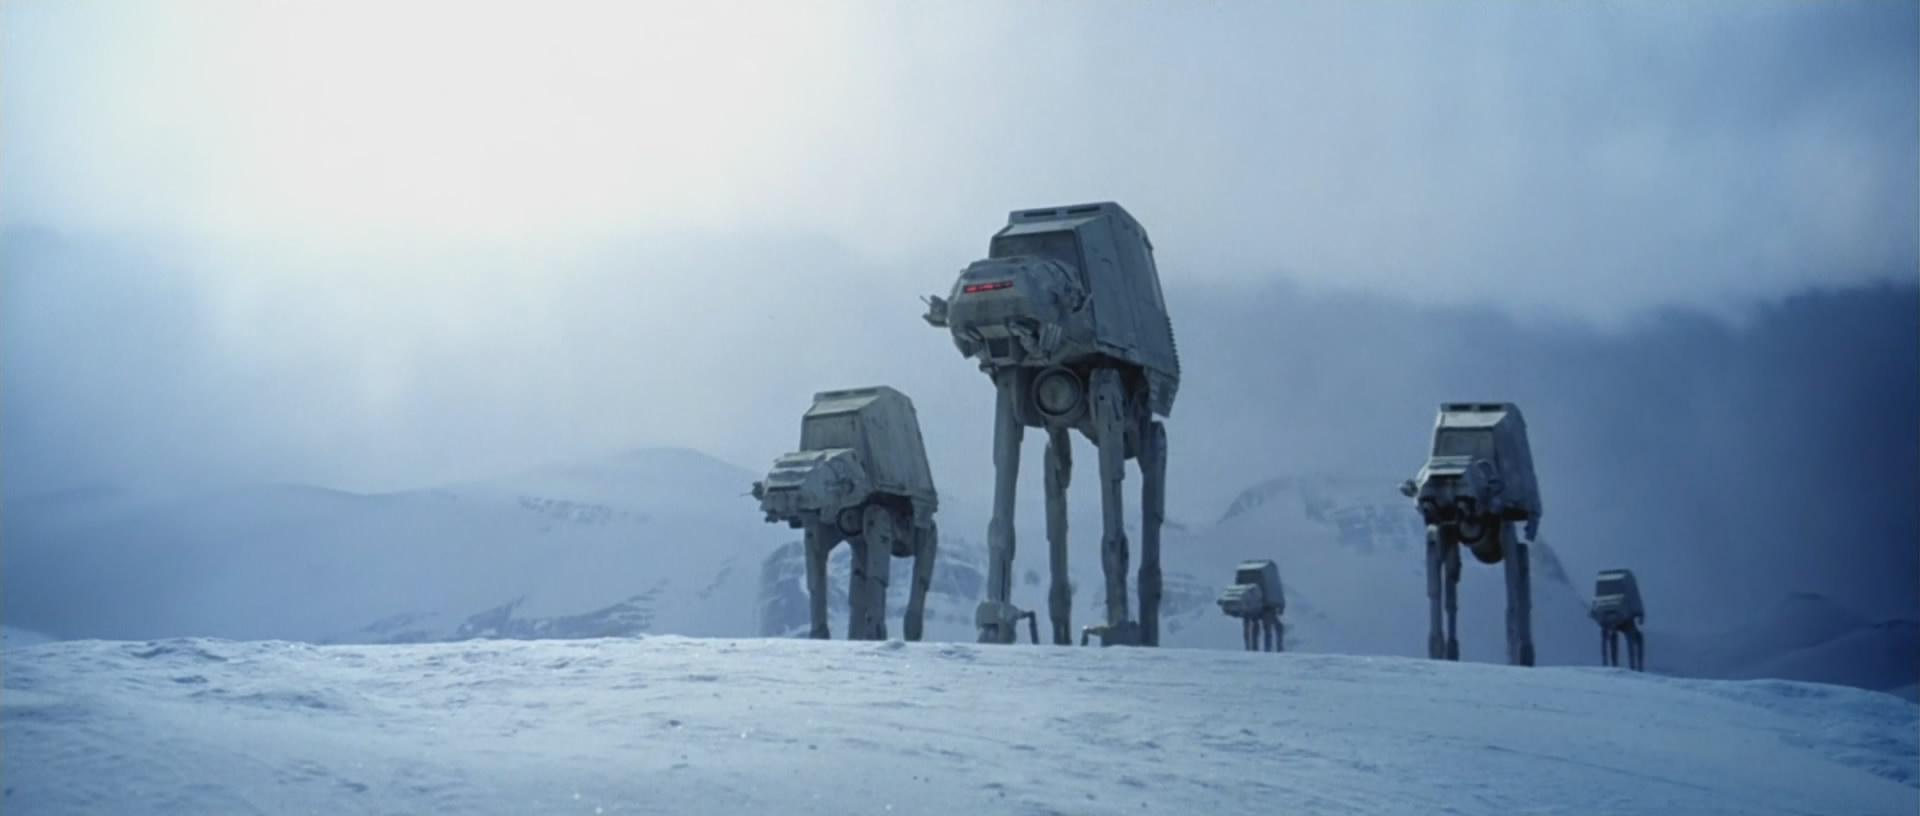 Star Wars at Walker